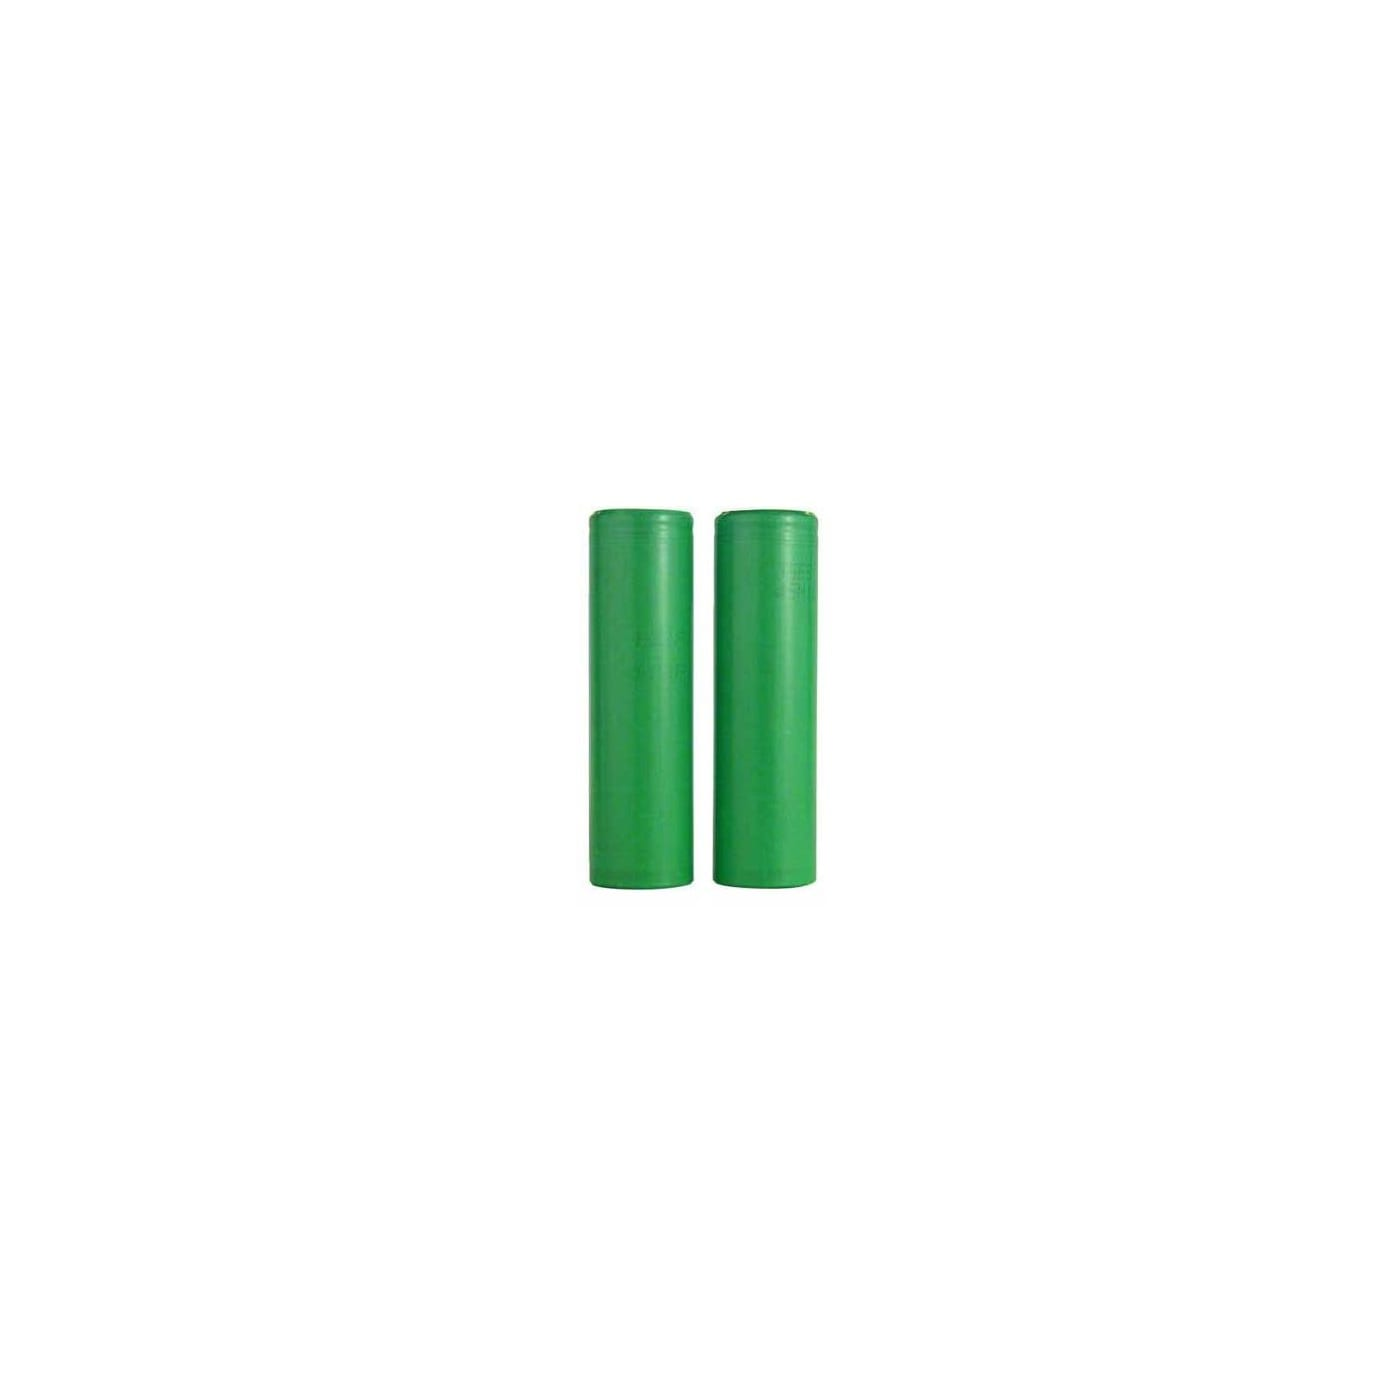 Imren 25R 18650 2500mAh - 2 Pack